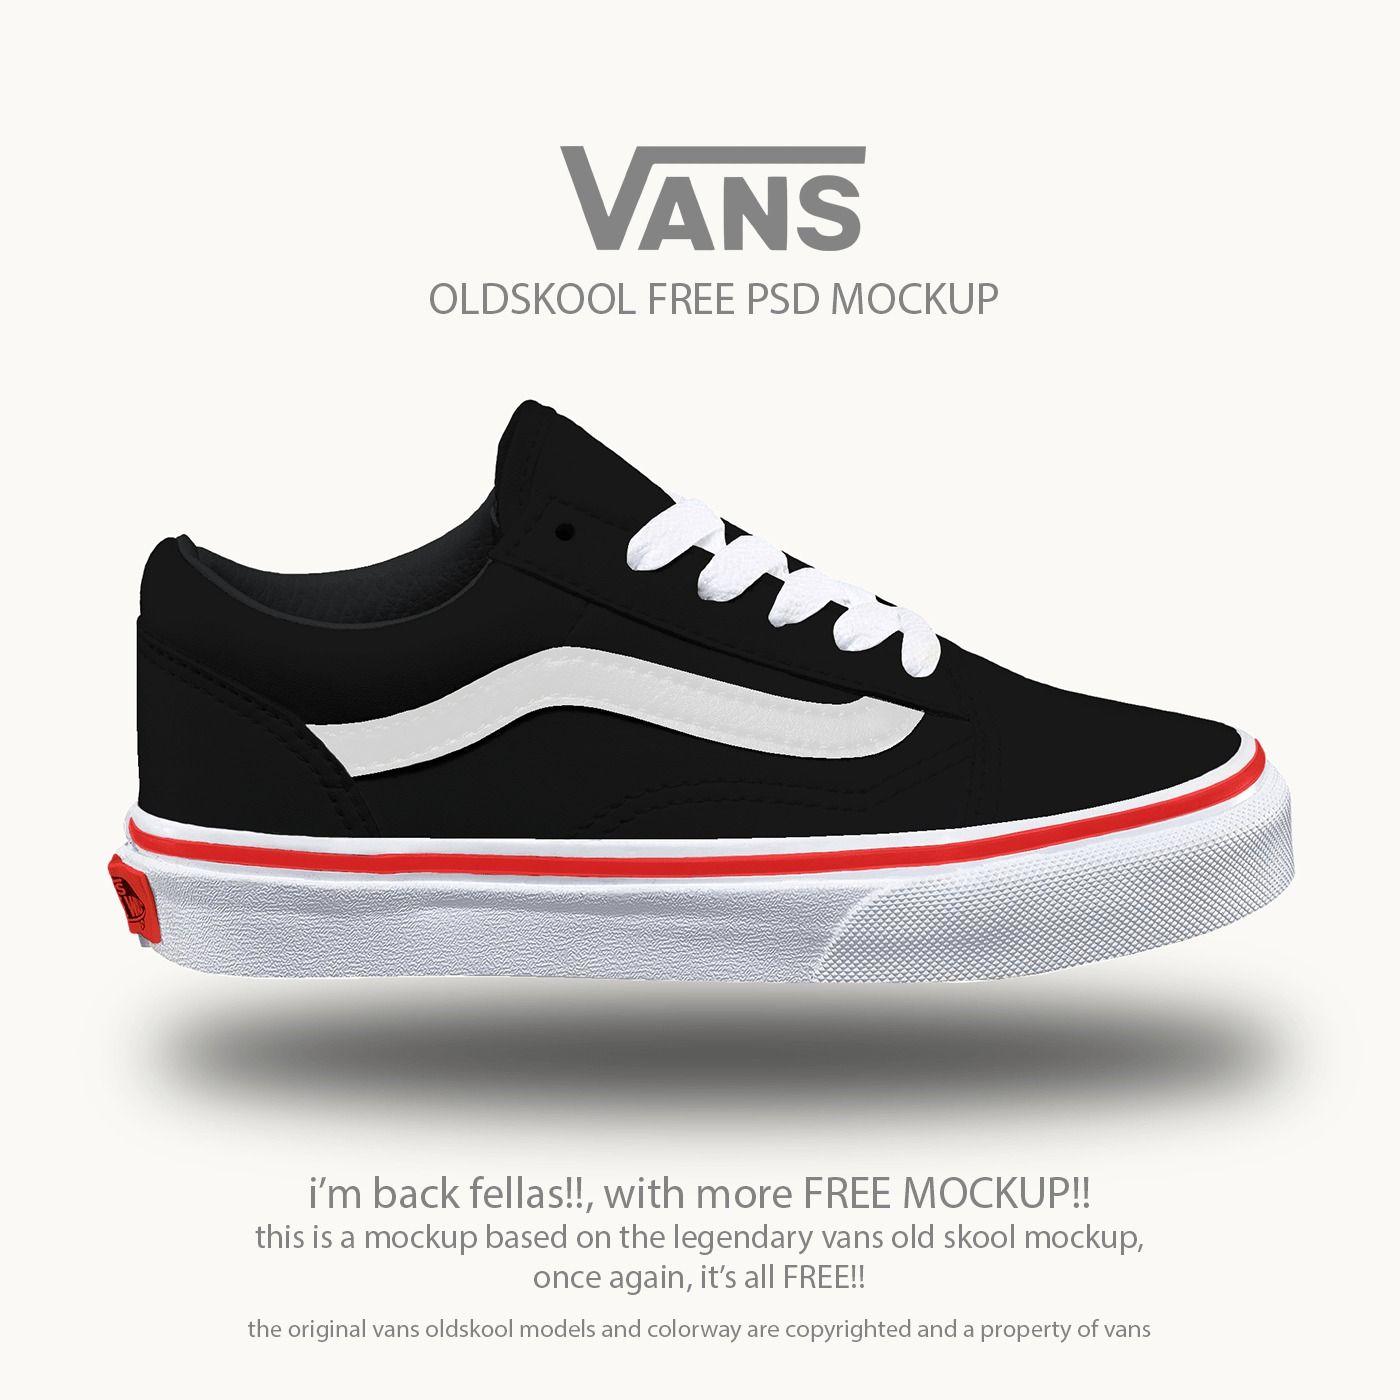 Download Vans Oldskool Free Psd Mockup Mockup Free Psd School Shoes Mockup Psd